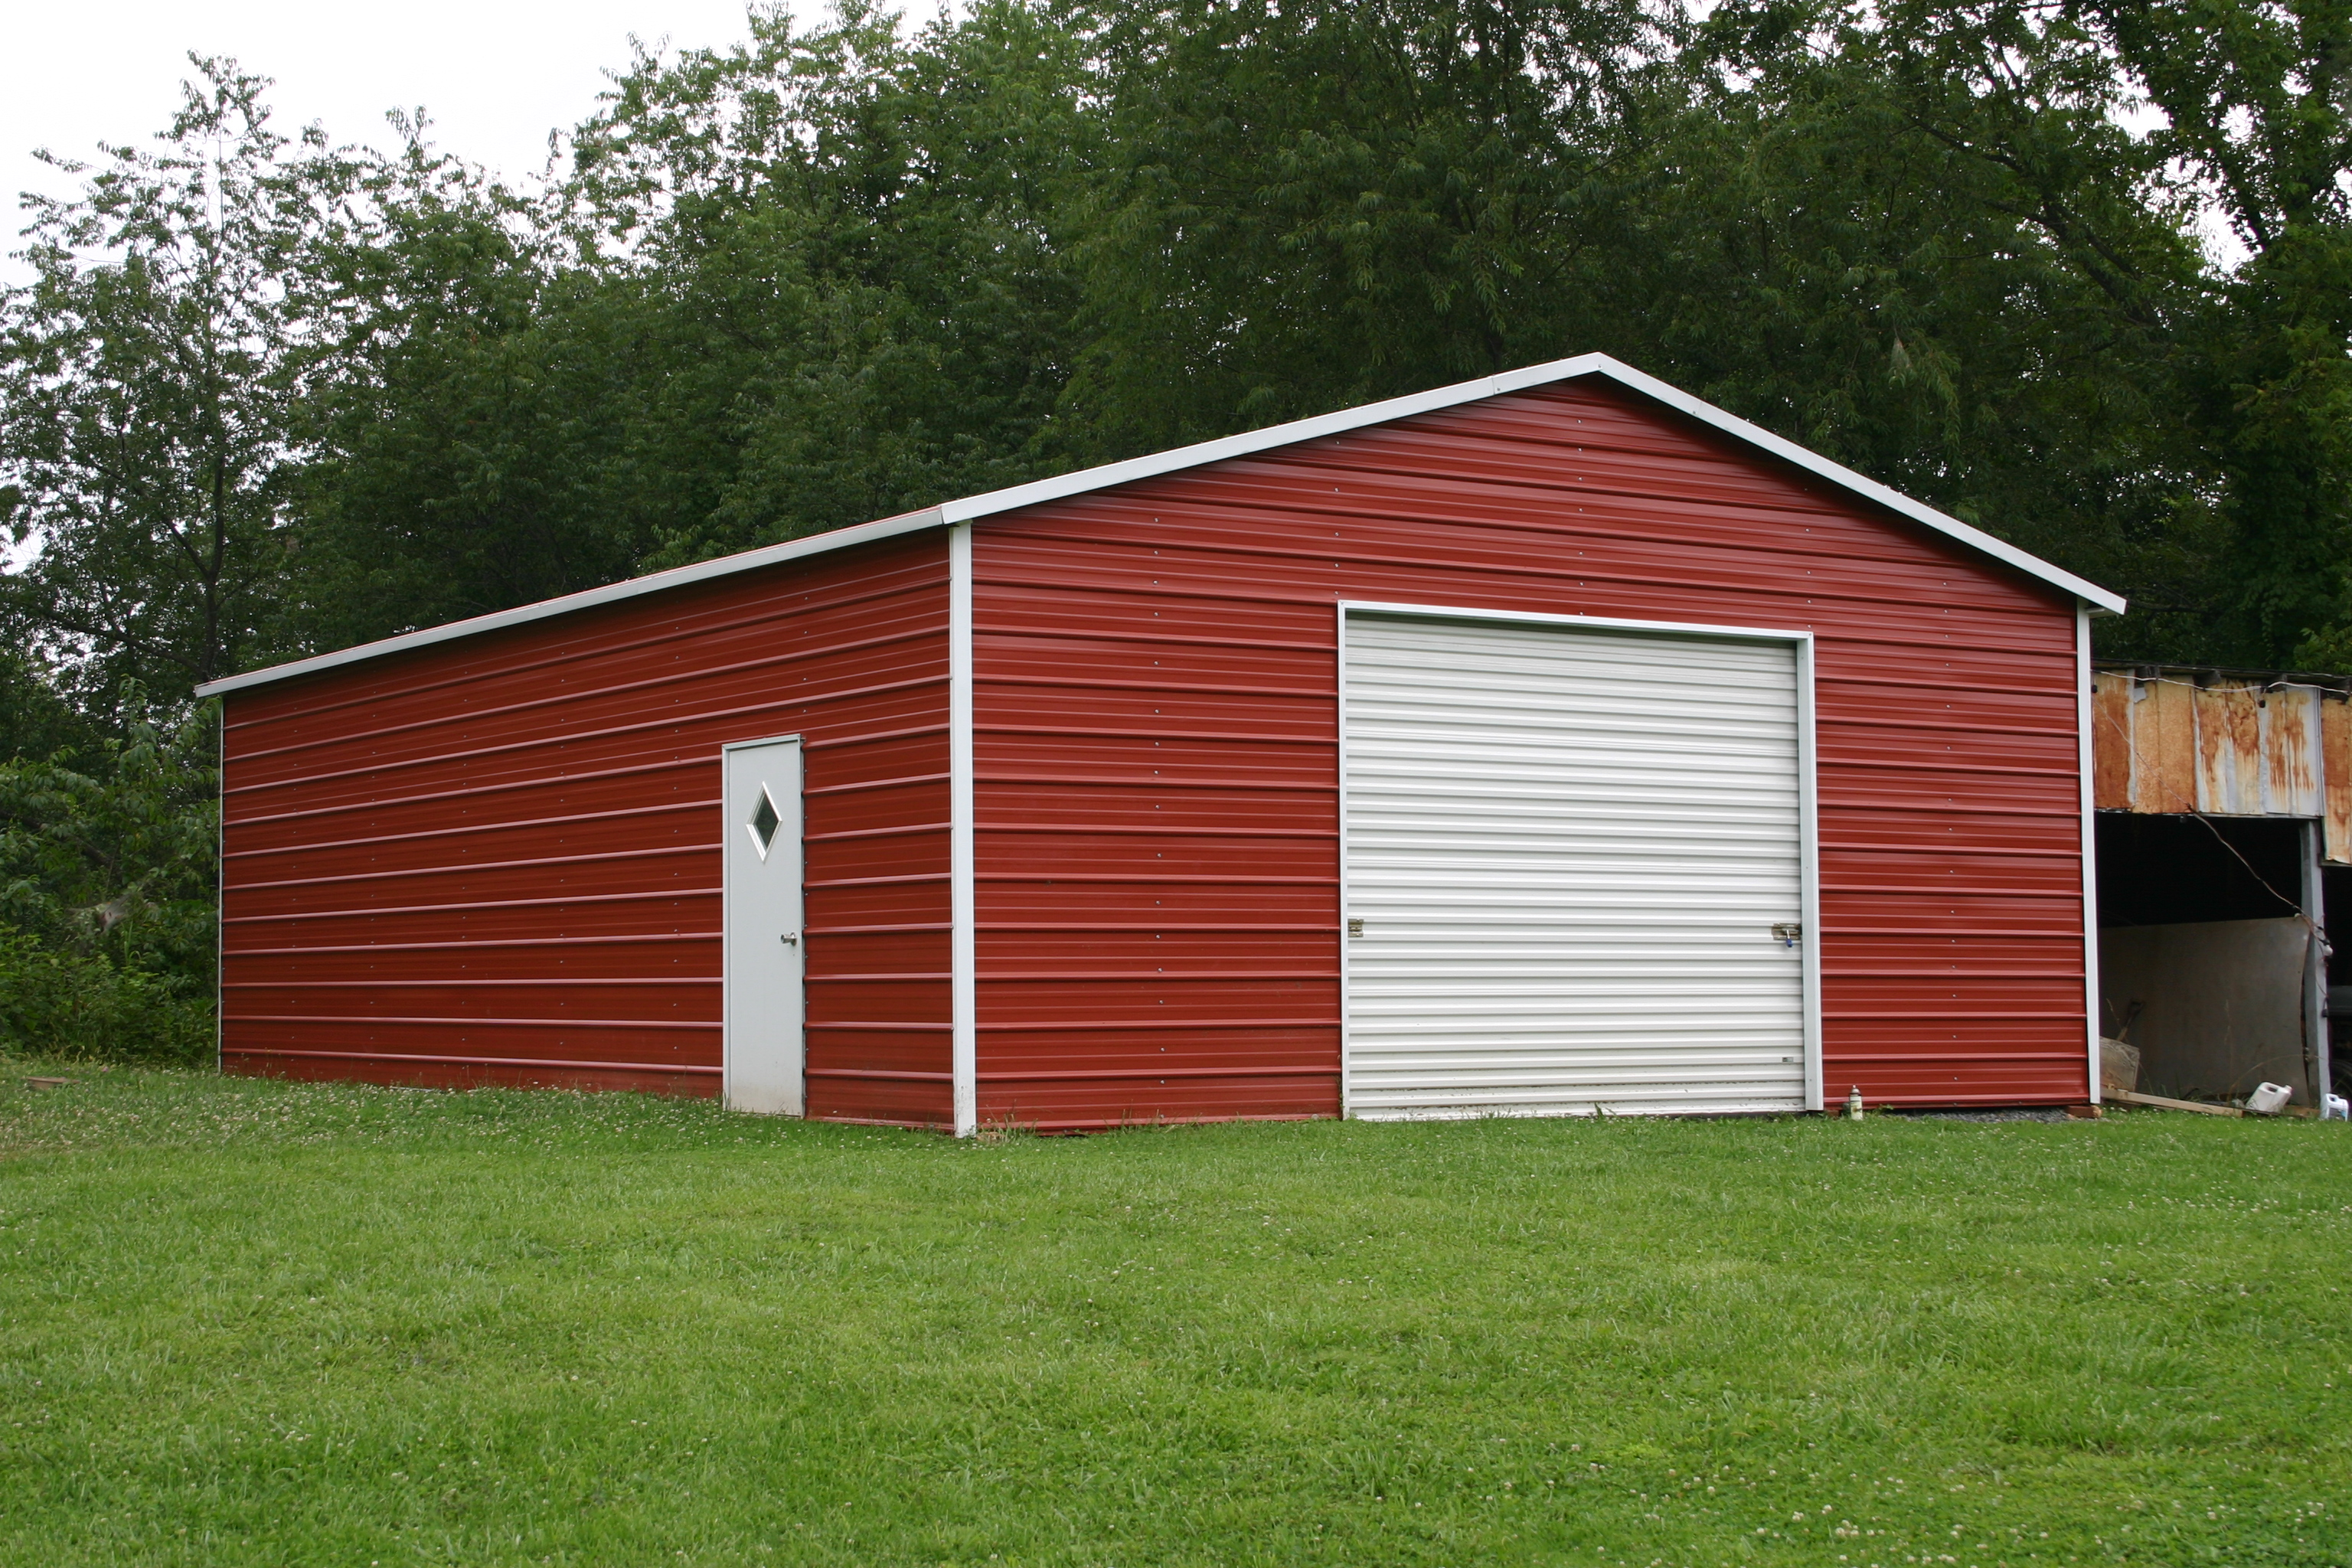 Boxed-eave-garage-1.jpg